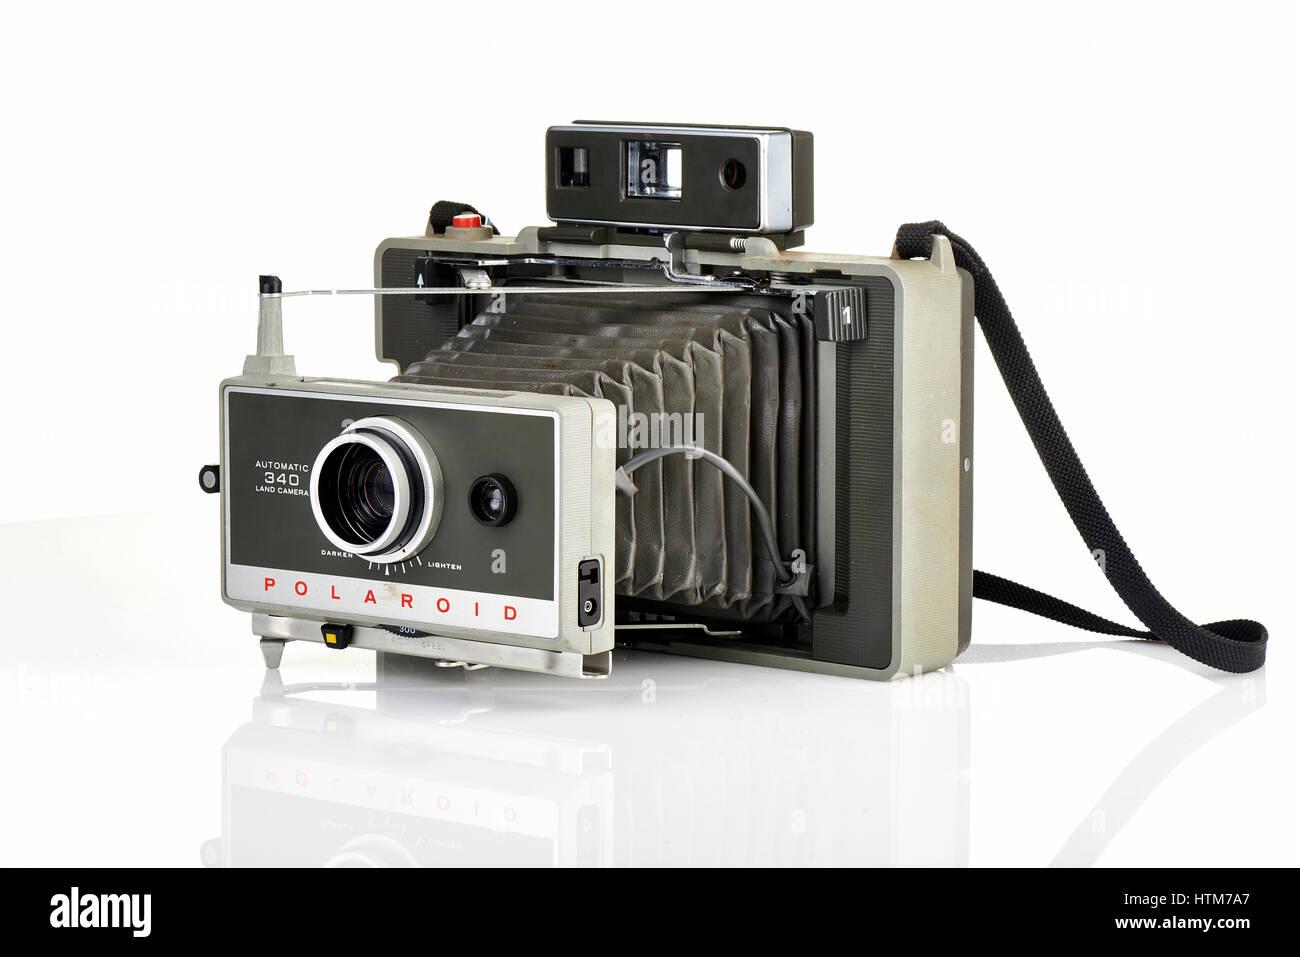 Brüssel, Belgien - 3. Februar 2014: Illustrative Editorial von einem Vintage Polaroid Sofortbildkamera Stockbild